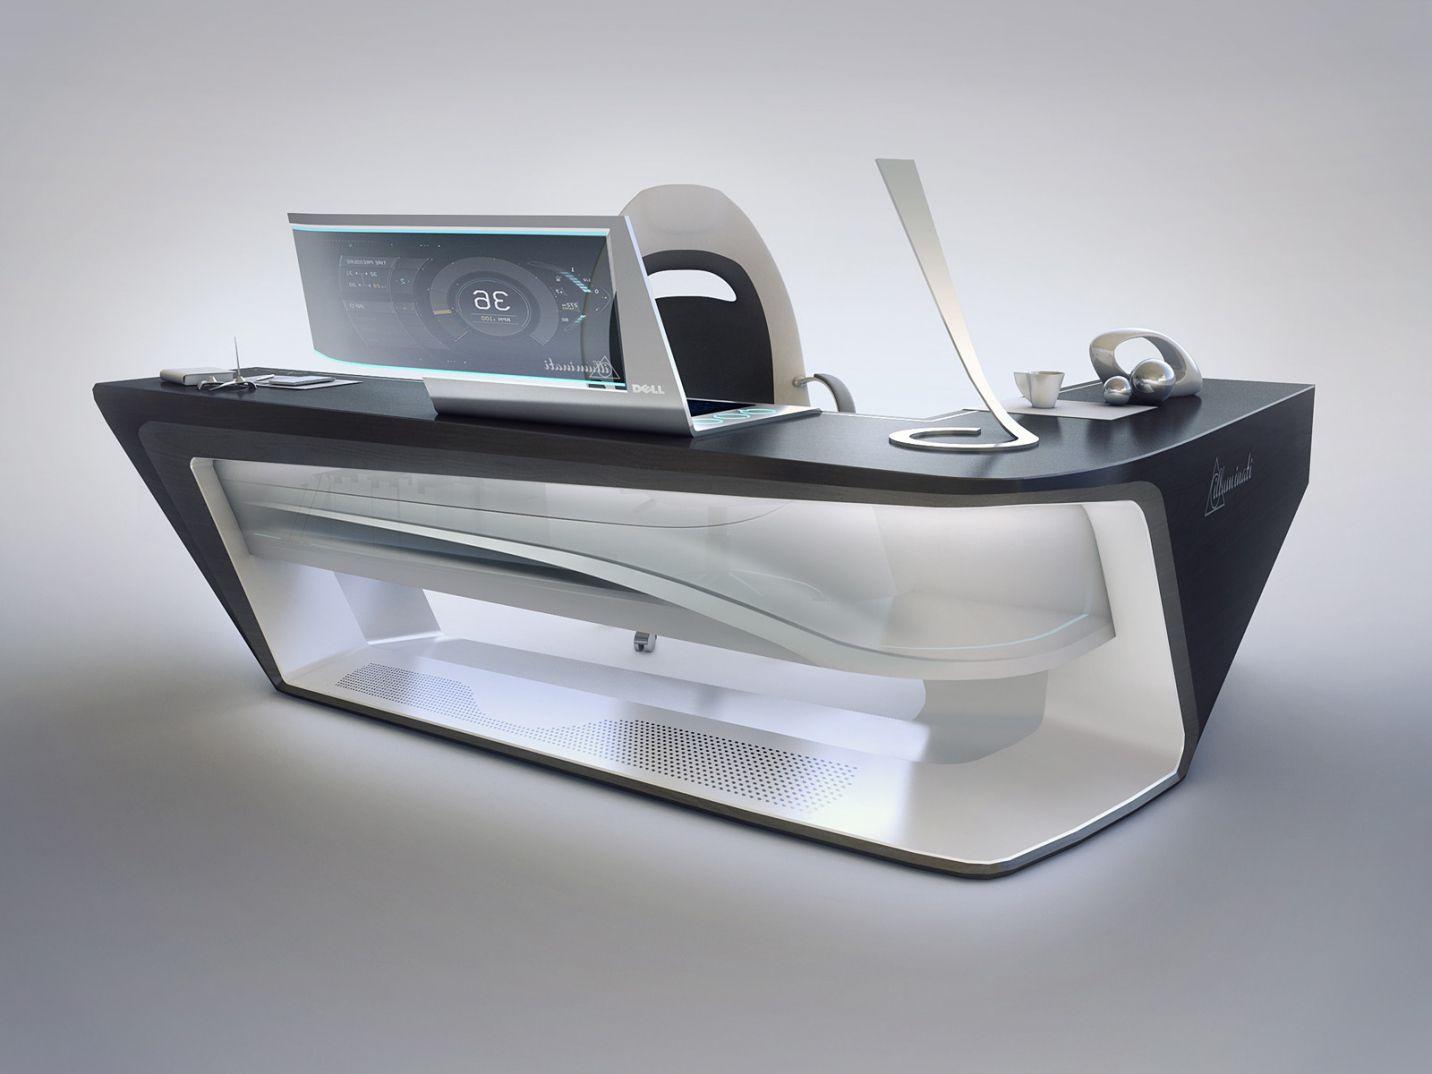 Futuristic Office Desk Luxury Home Office Furniture Check More At Http Michael Malarkey Com Futuristic Office De Desk Modern Design Desk Design Modern Desk